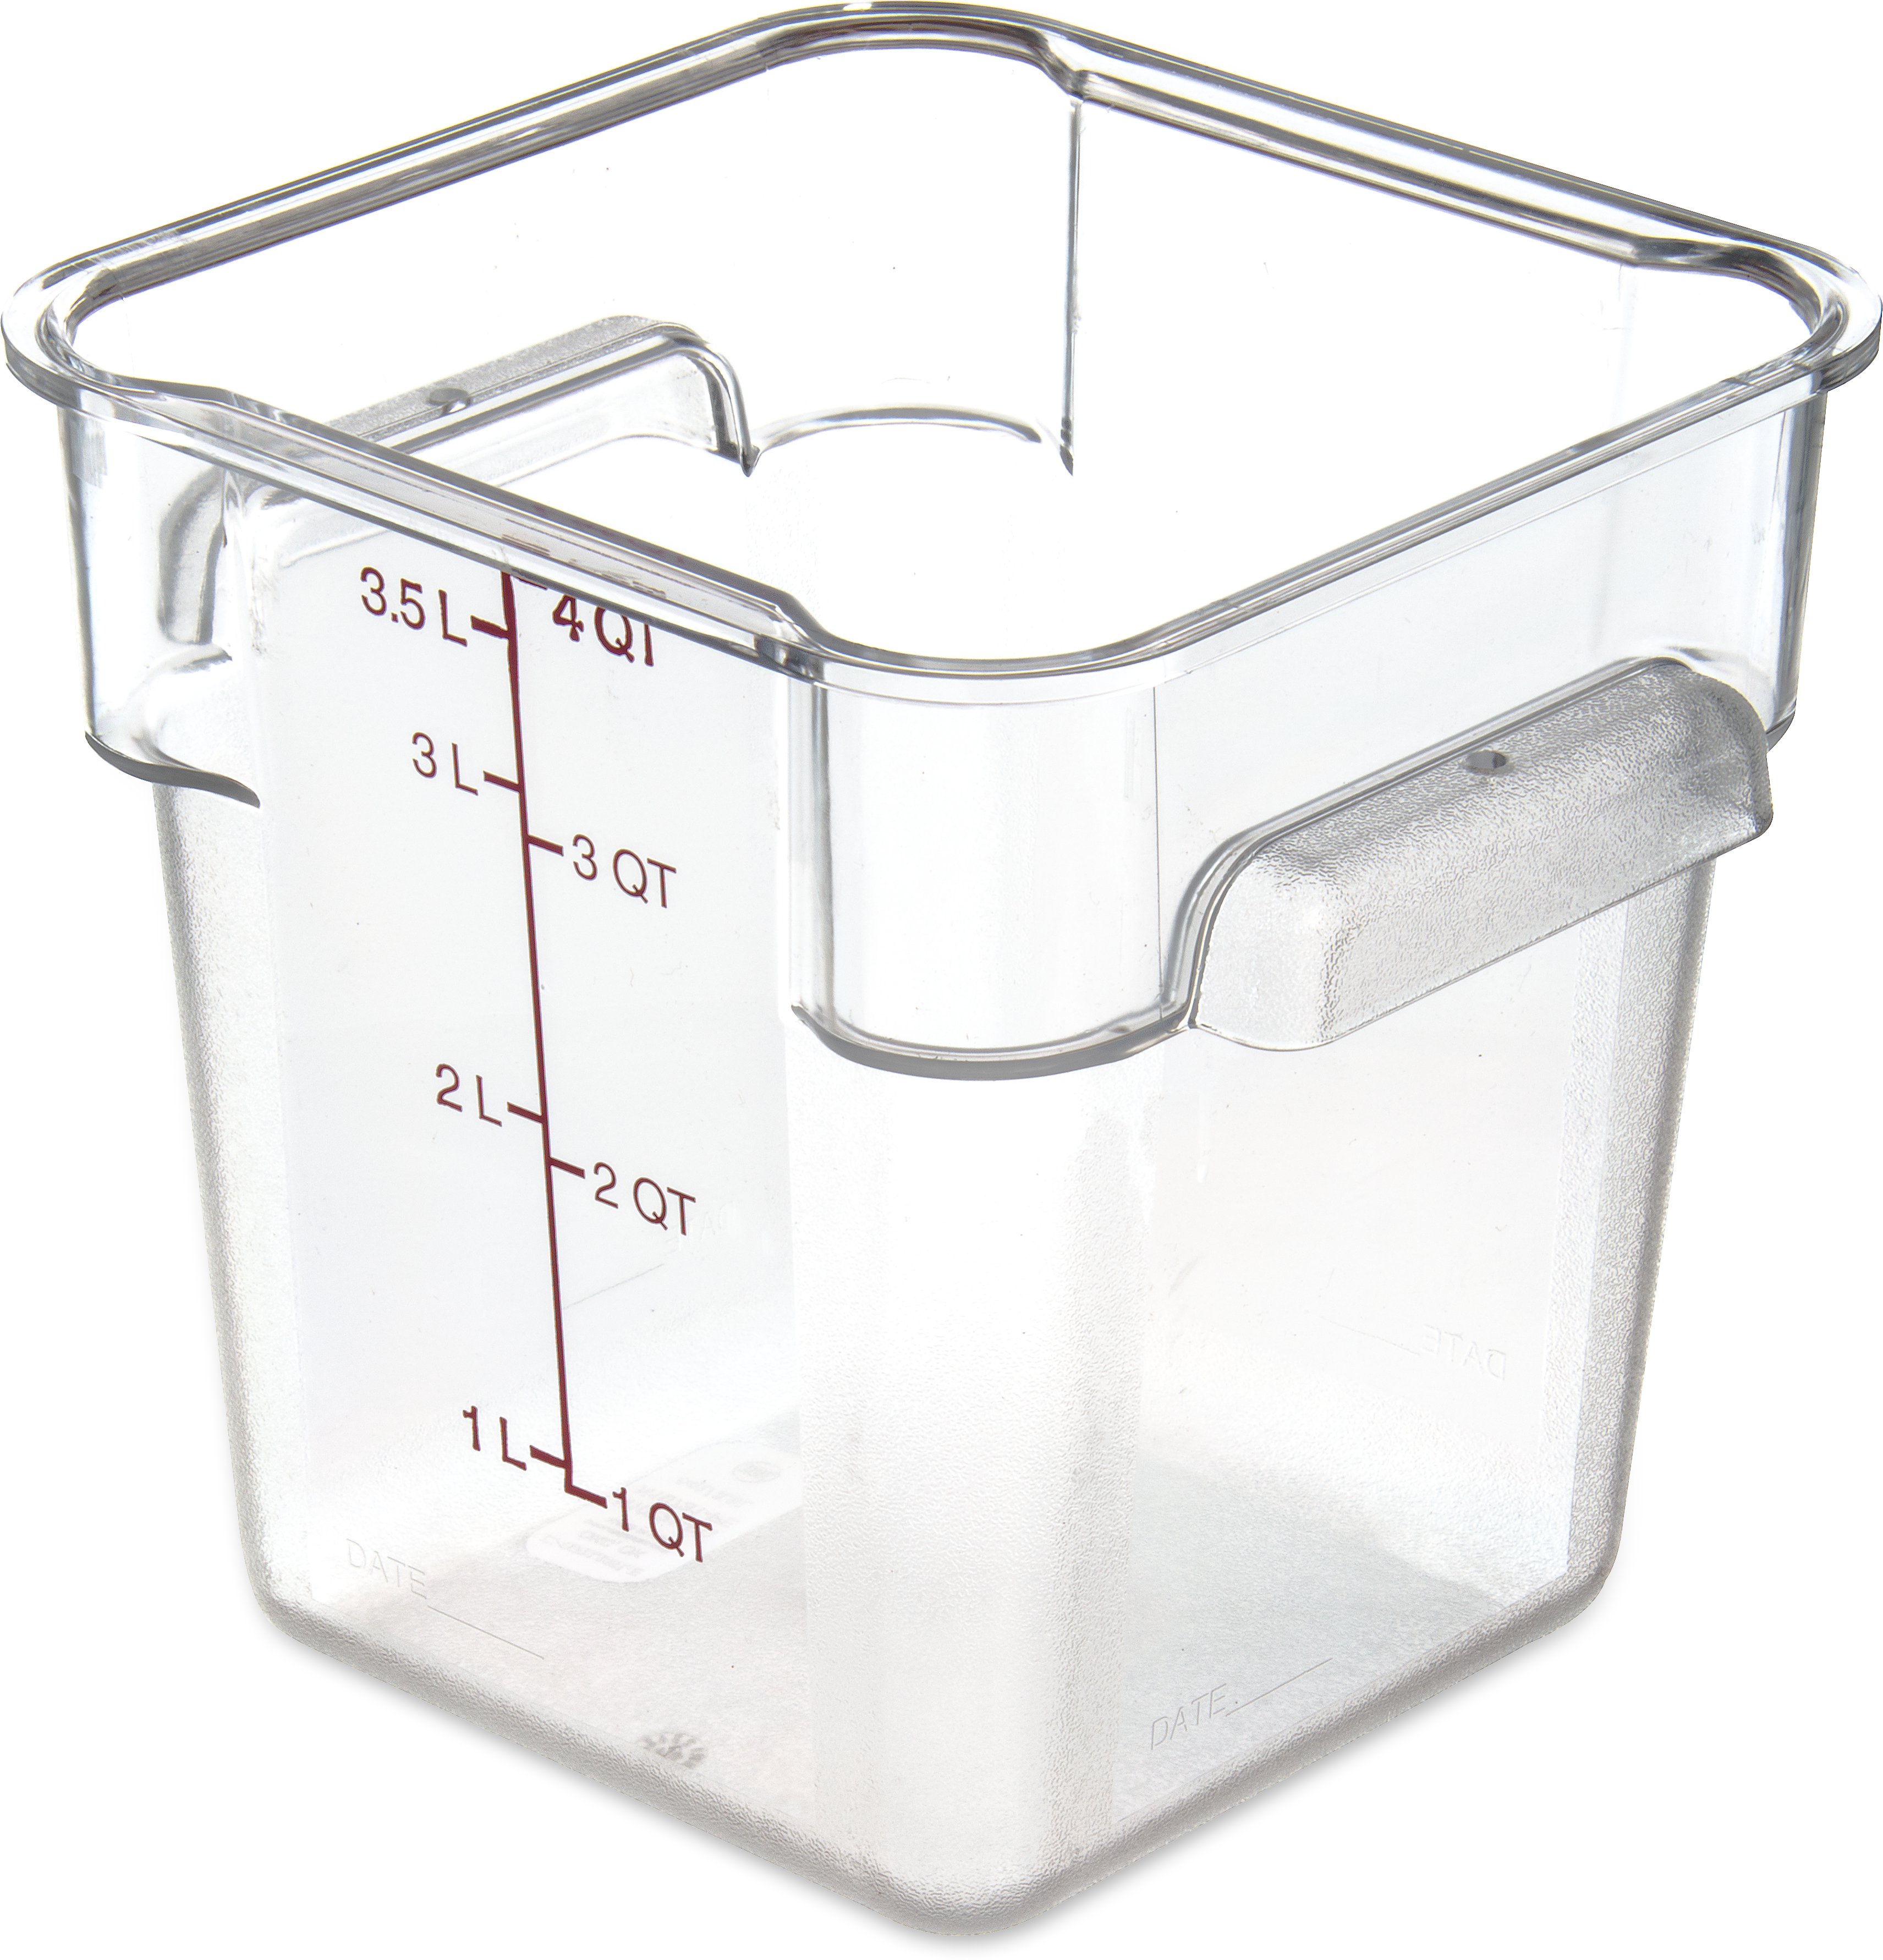 StorPlus Polycarbonate Square Food Square Container 4 qt - Purple